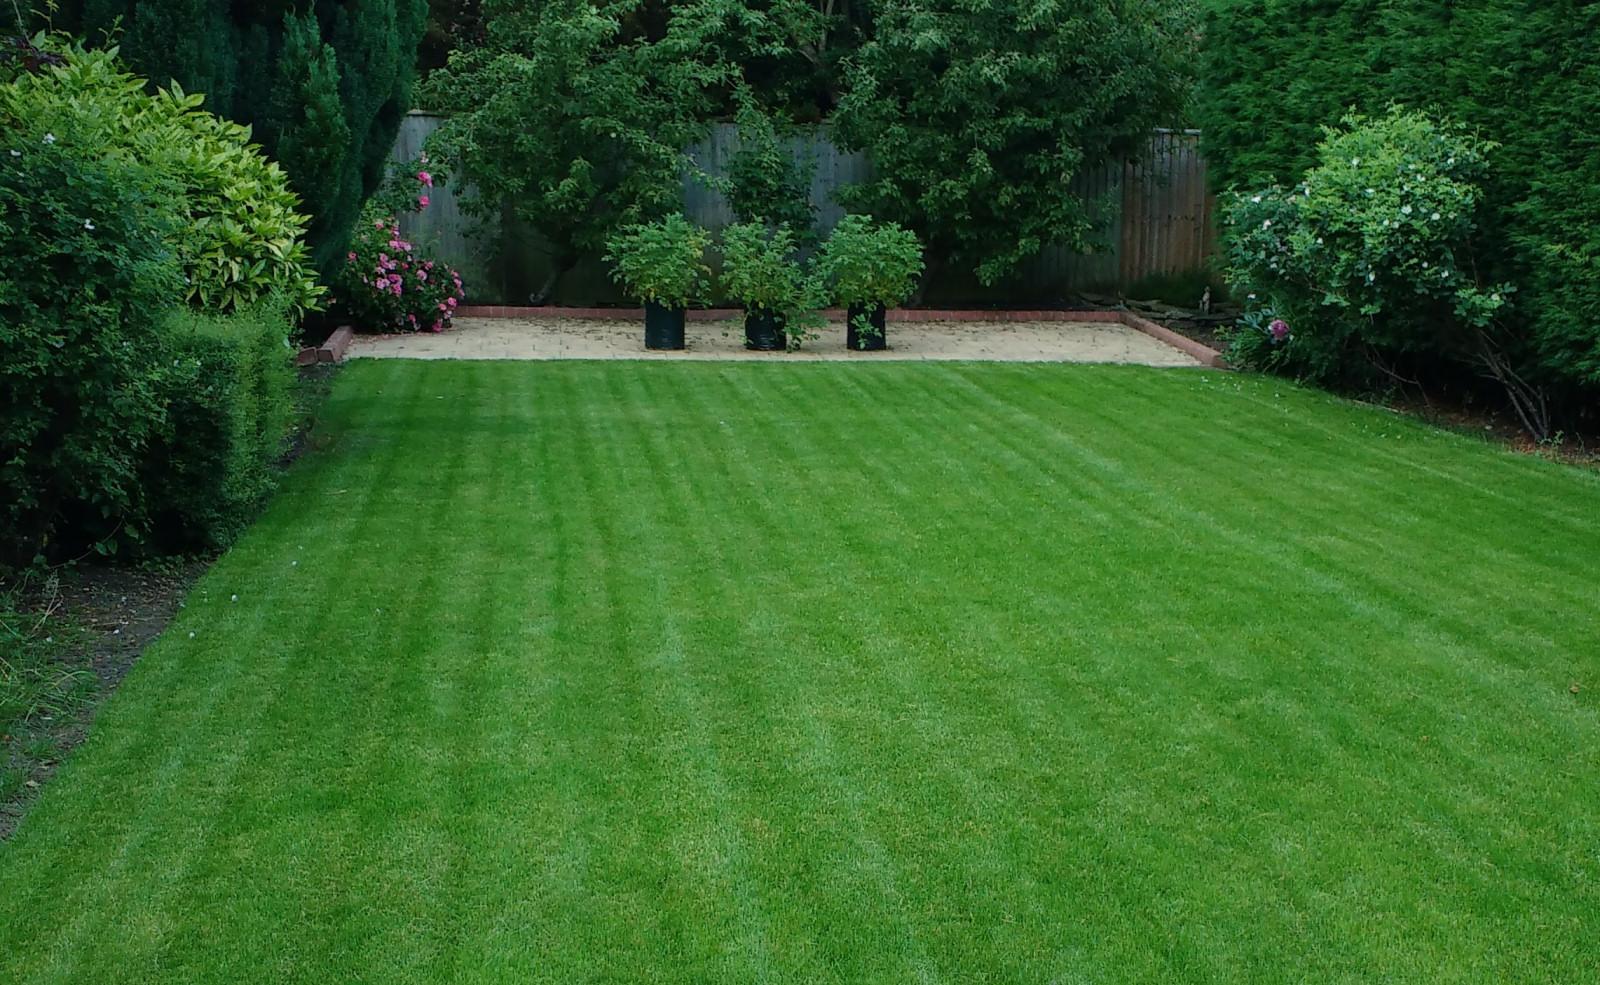 A new, green lawn